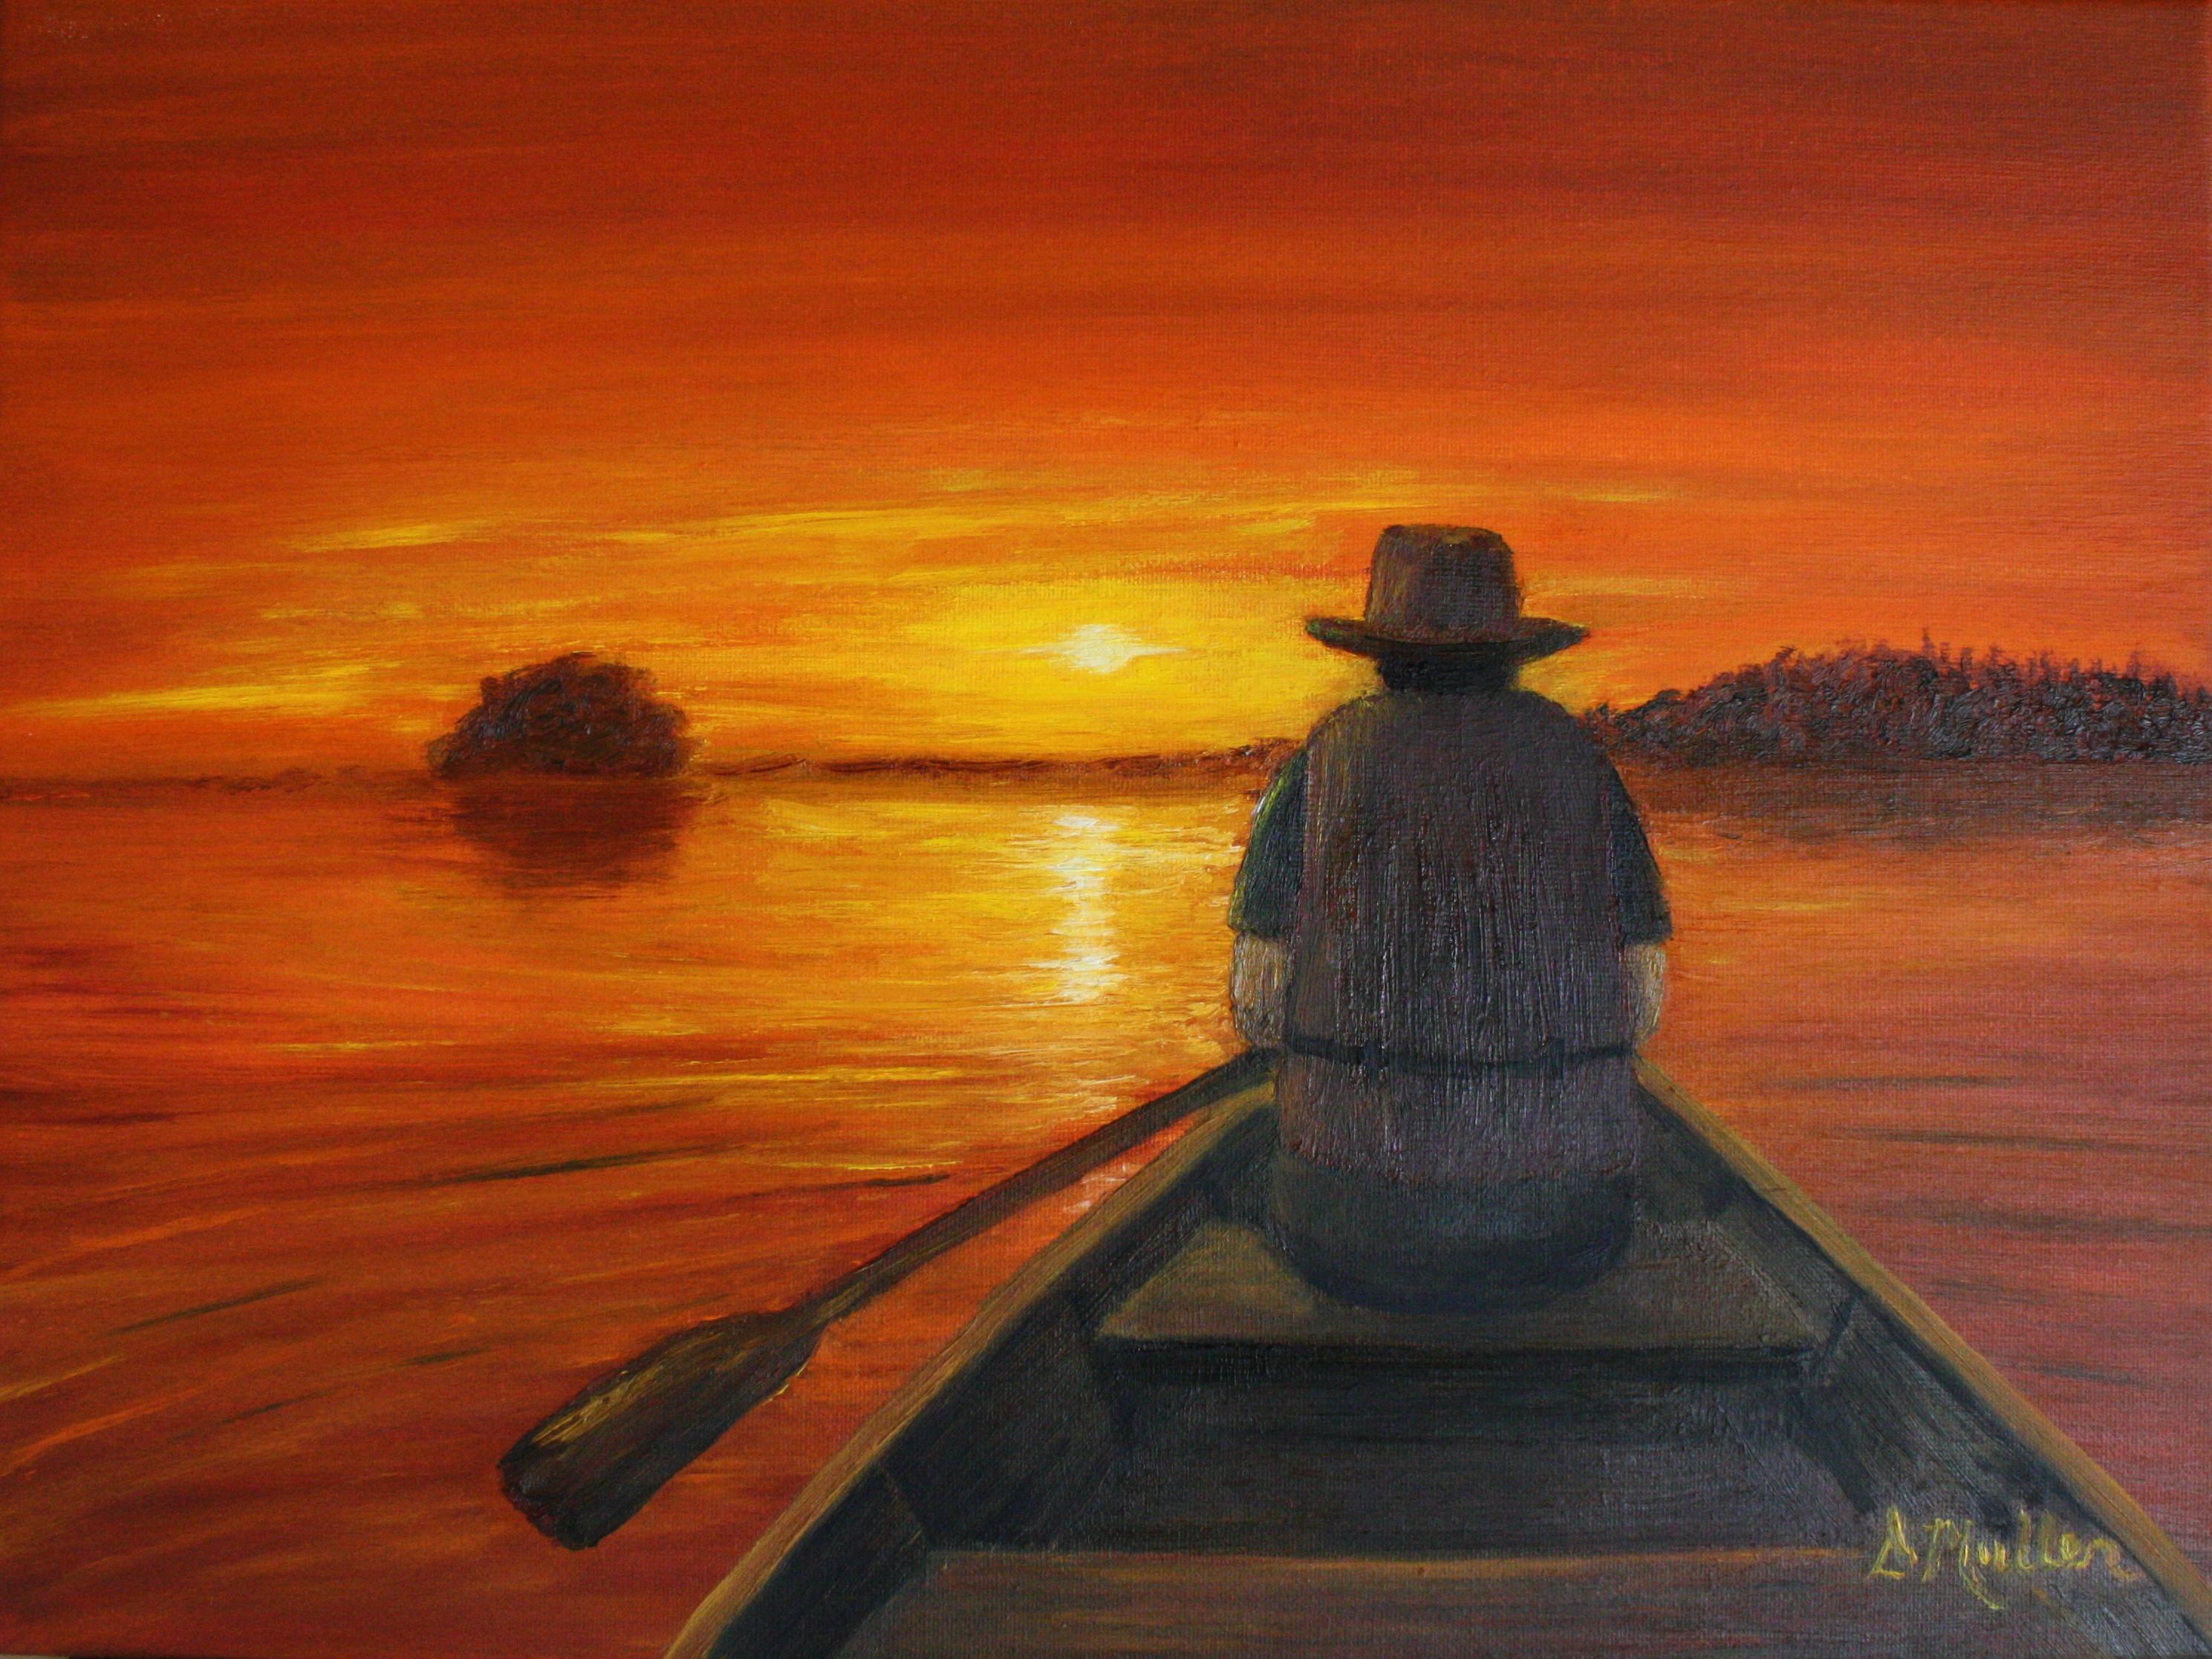 Canoe, sunset